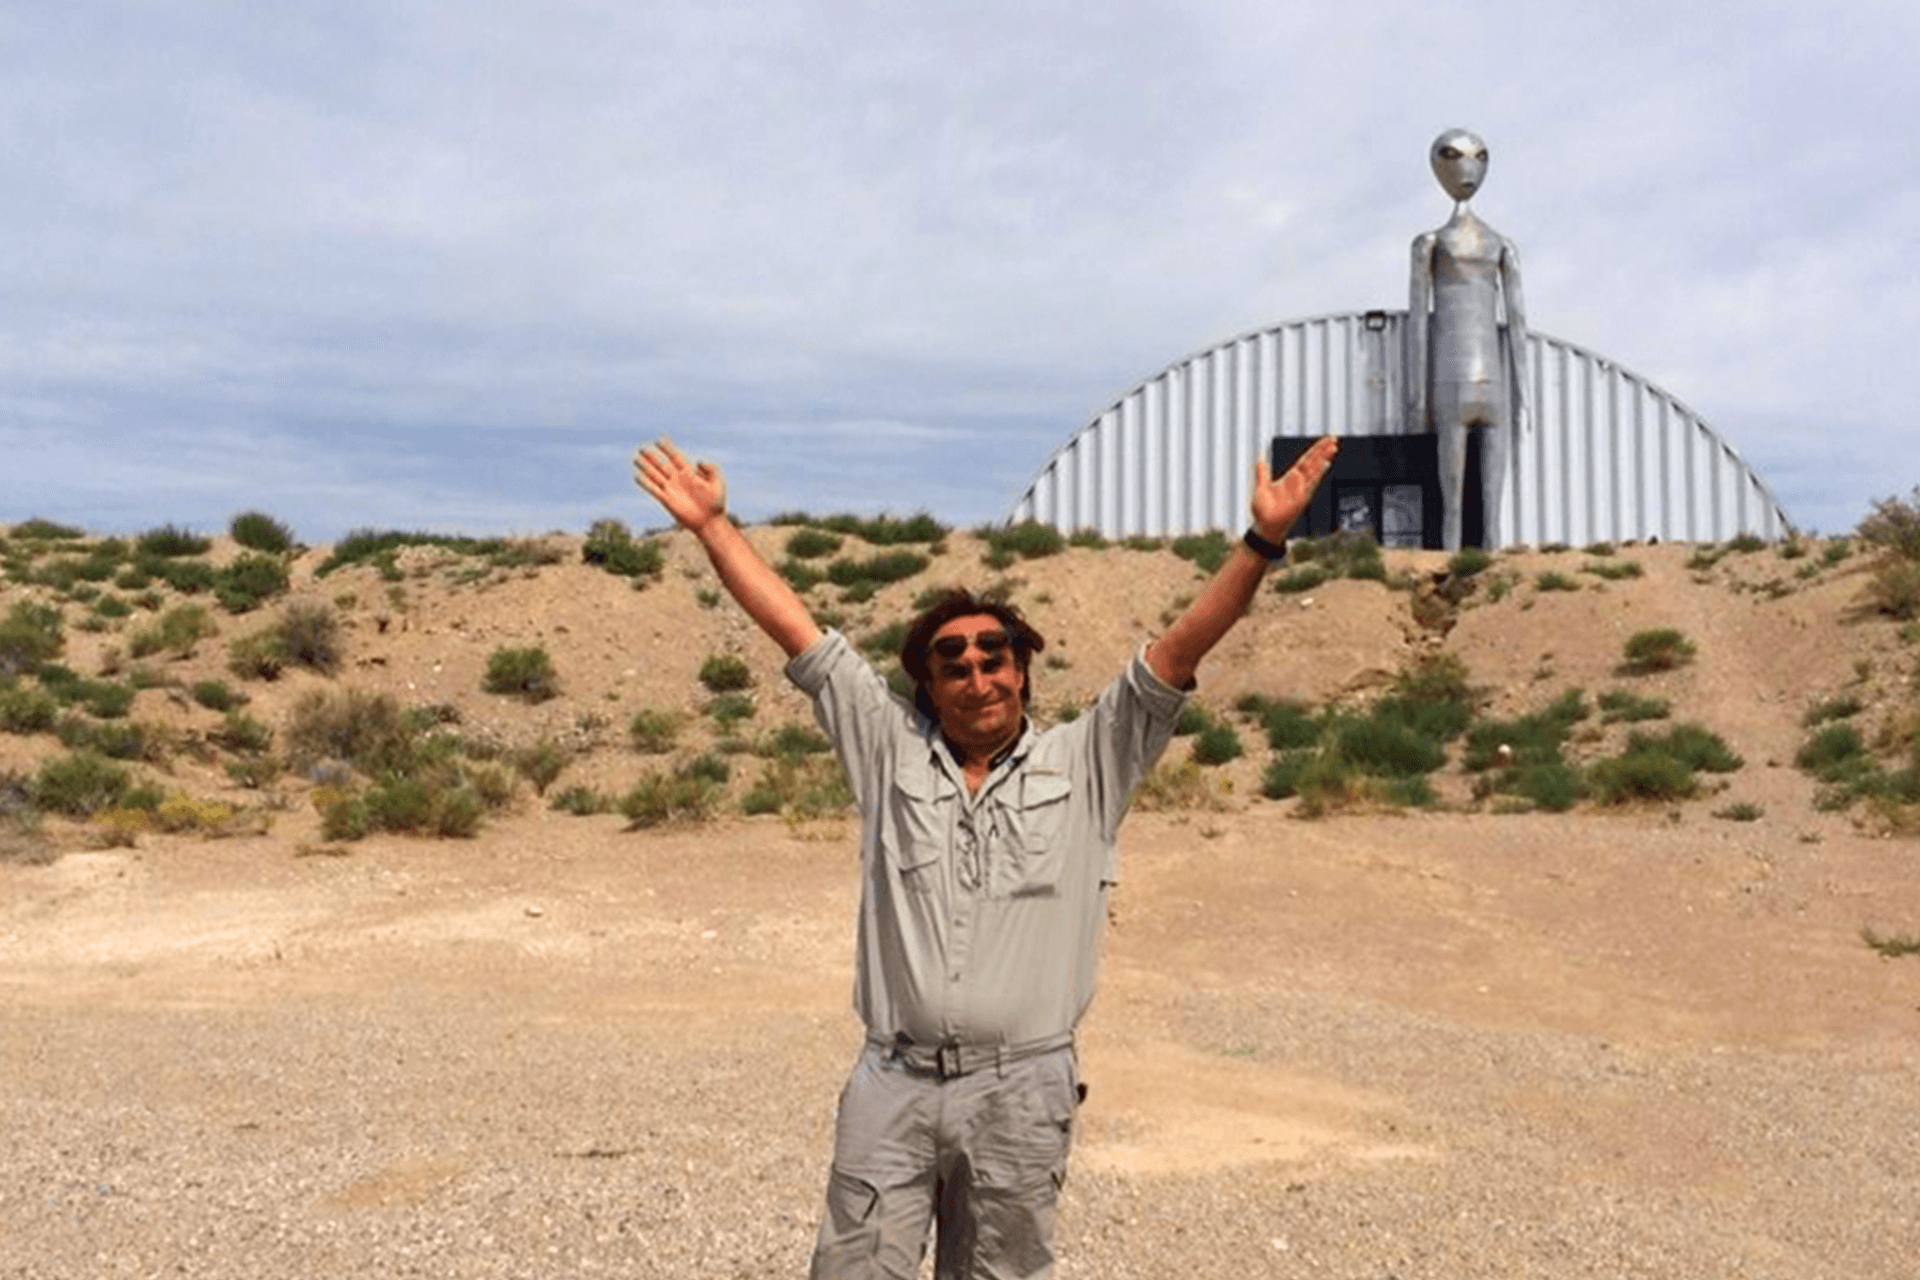 Area 51 Tour from Las Vegas